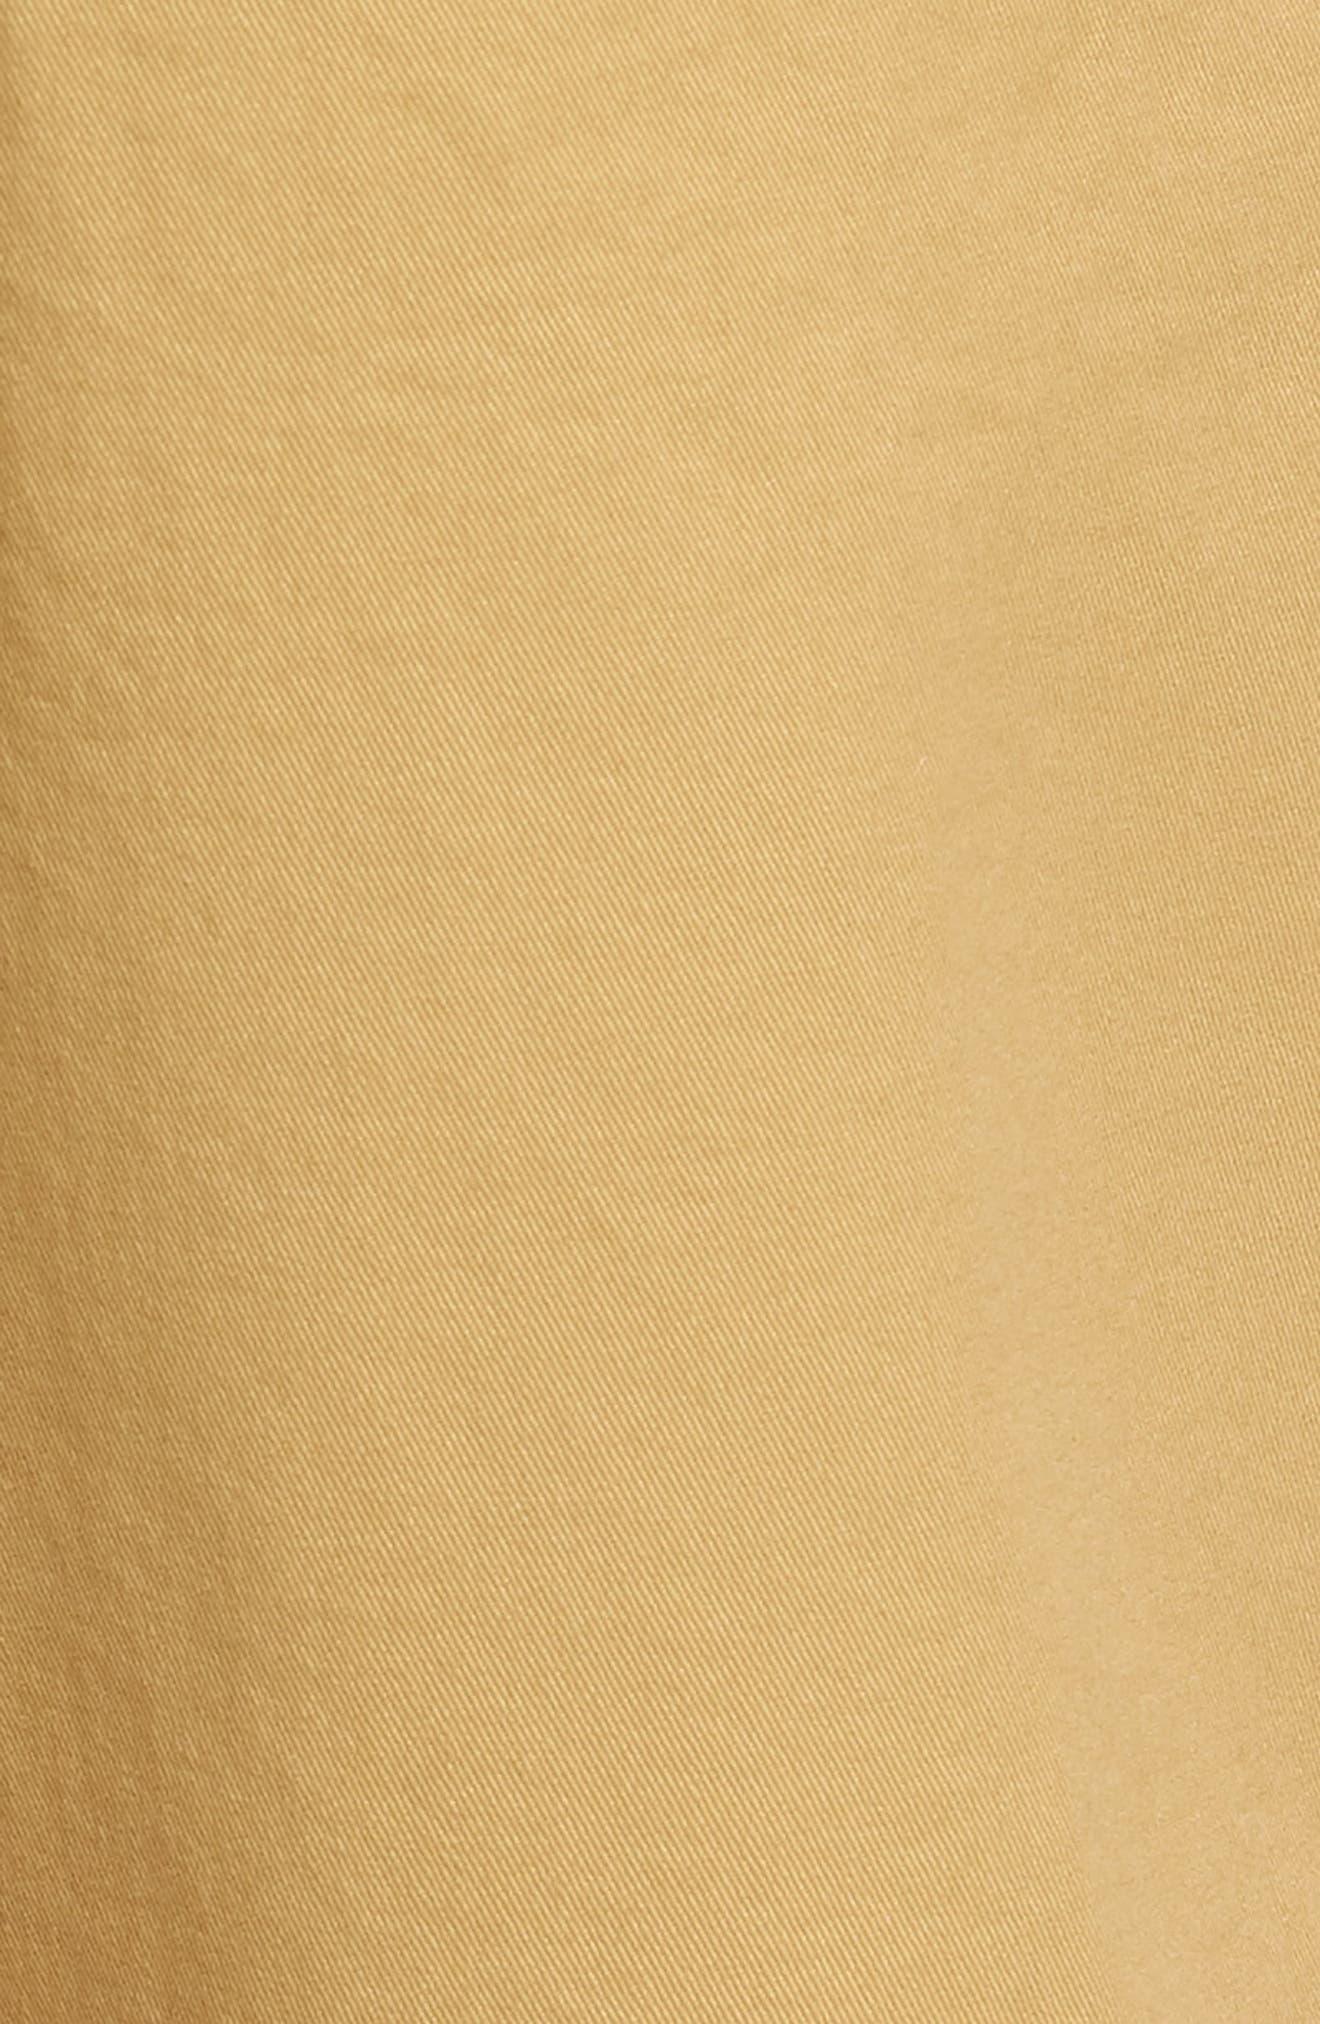 Ballard Slim Fit Stretch Chino 11-Inch Shorts,                             Alternate thumbnail 66, color,